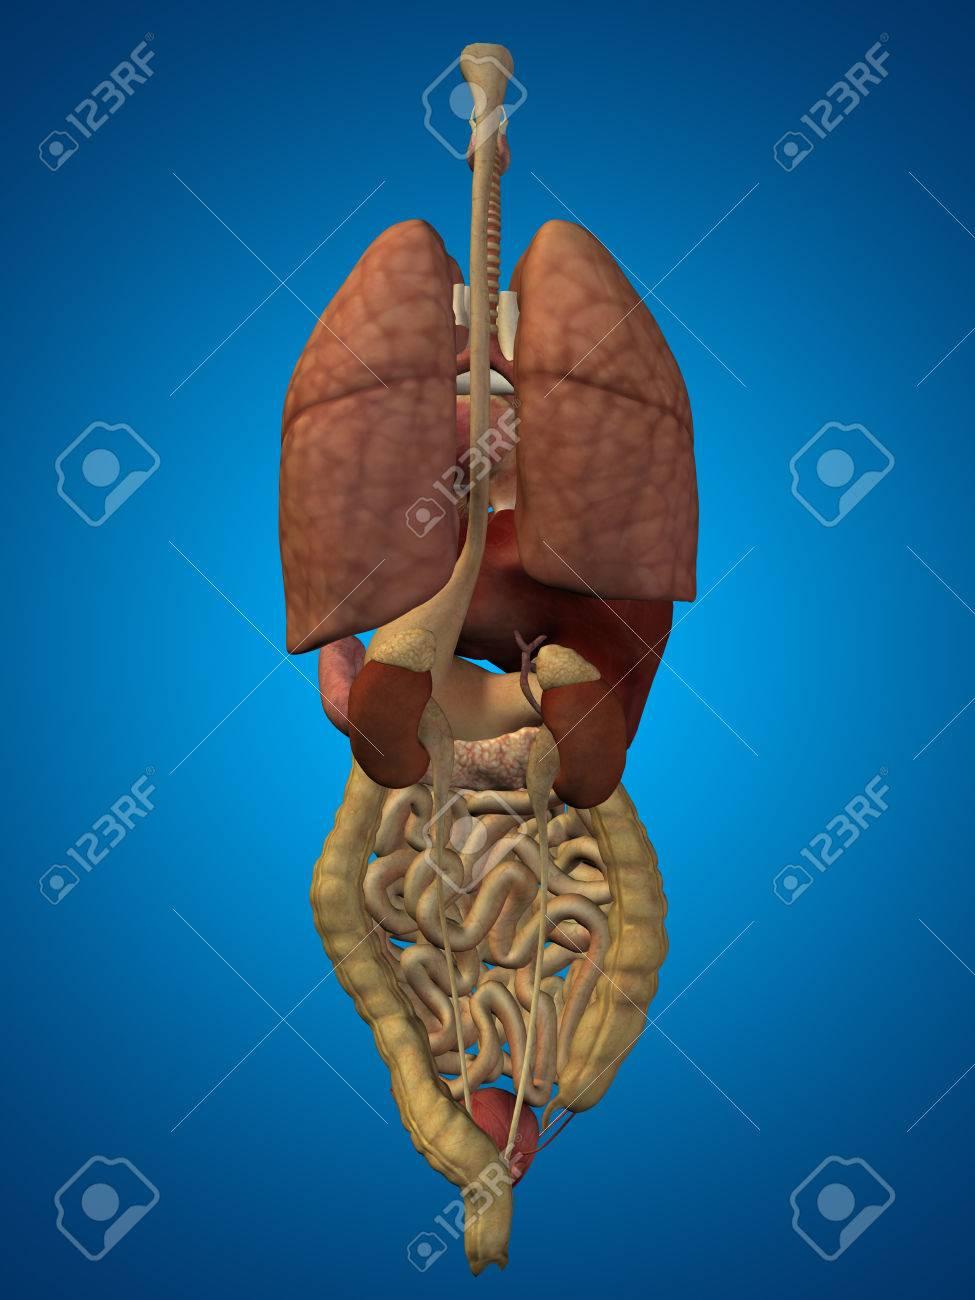 3d Human Or Man Internal Abdominal Or Thorax Organs For Anatomy